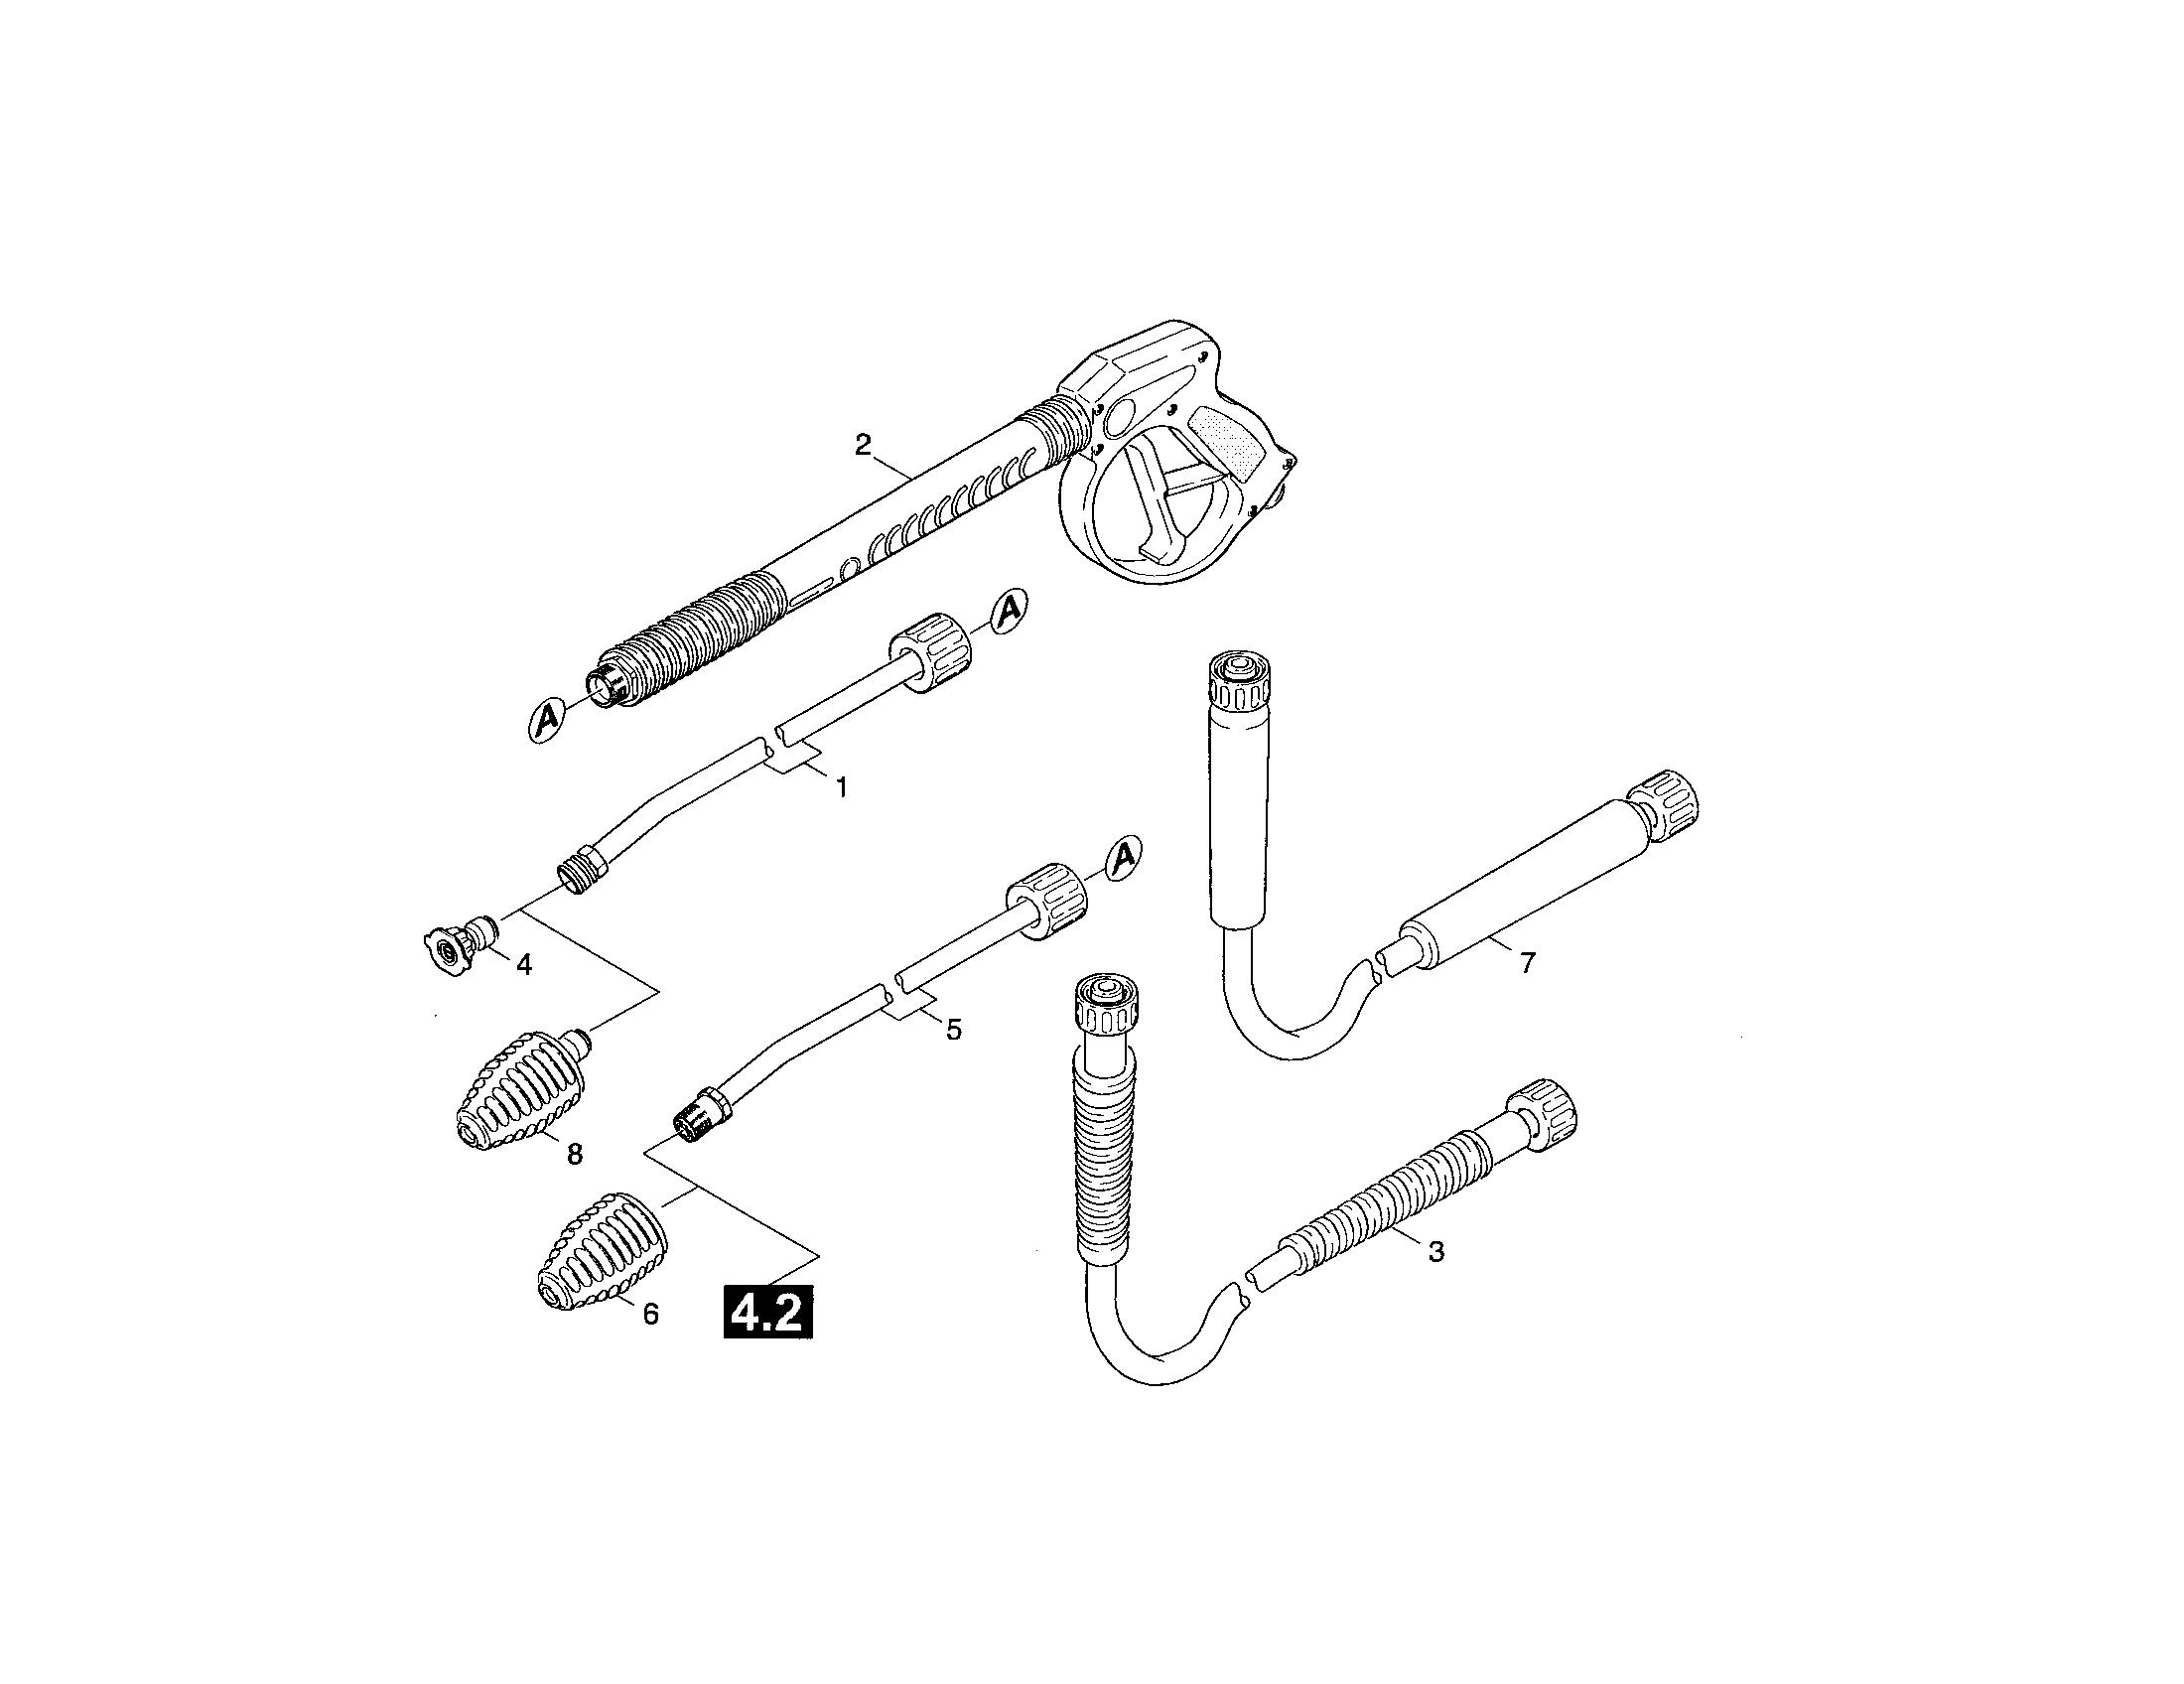 Karcher Pressure Washer Nozzle Diagram